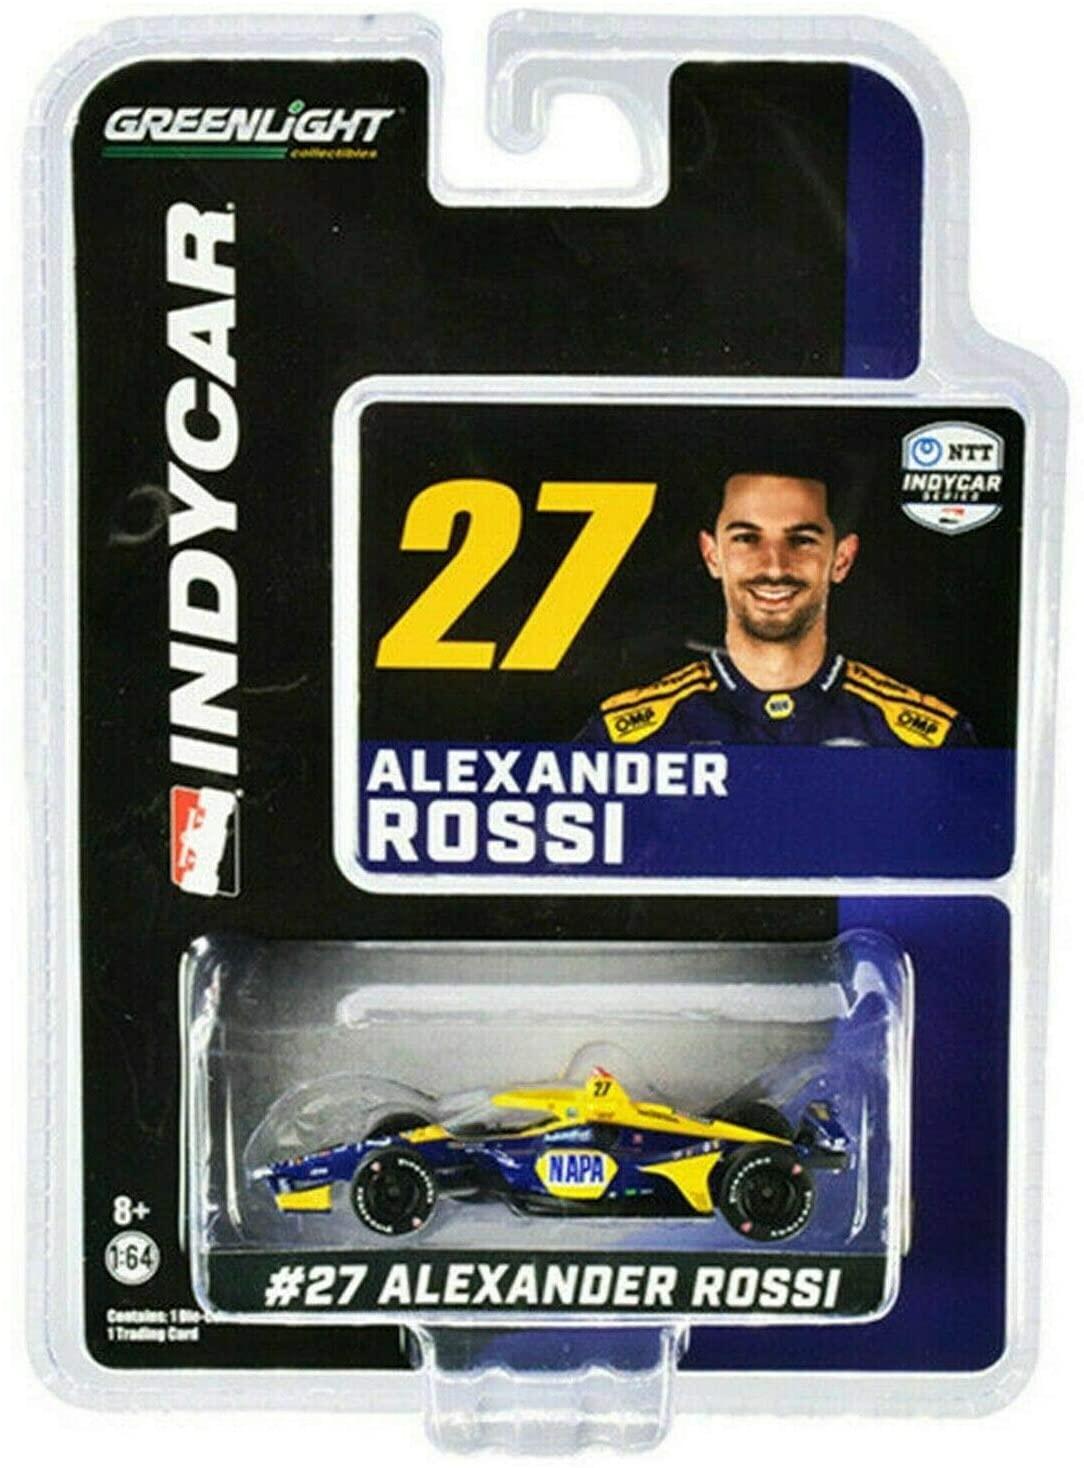 Greenlight Toys 1:64th Alexander Rossi -Andretti Autosport #27 NAPA 2020